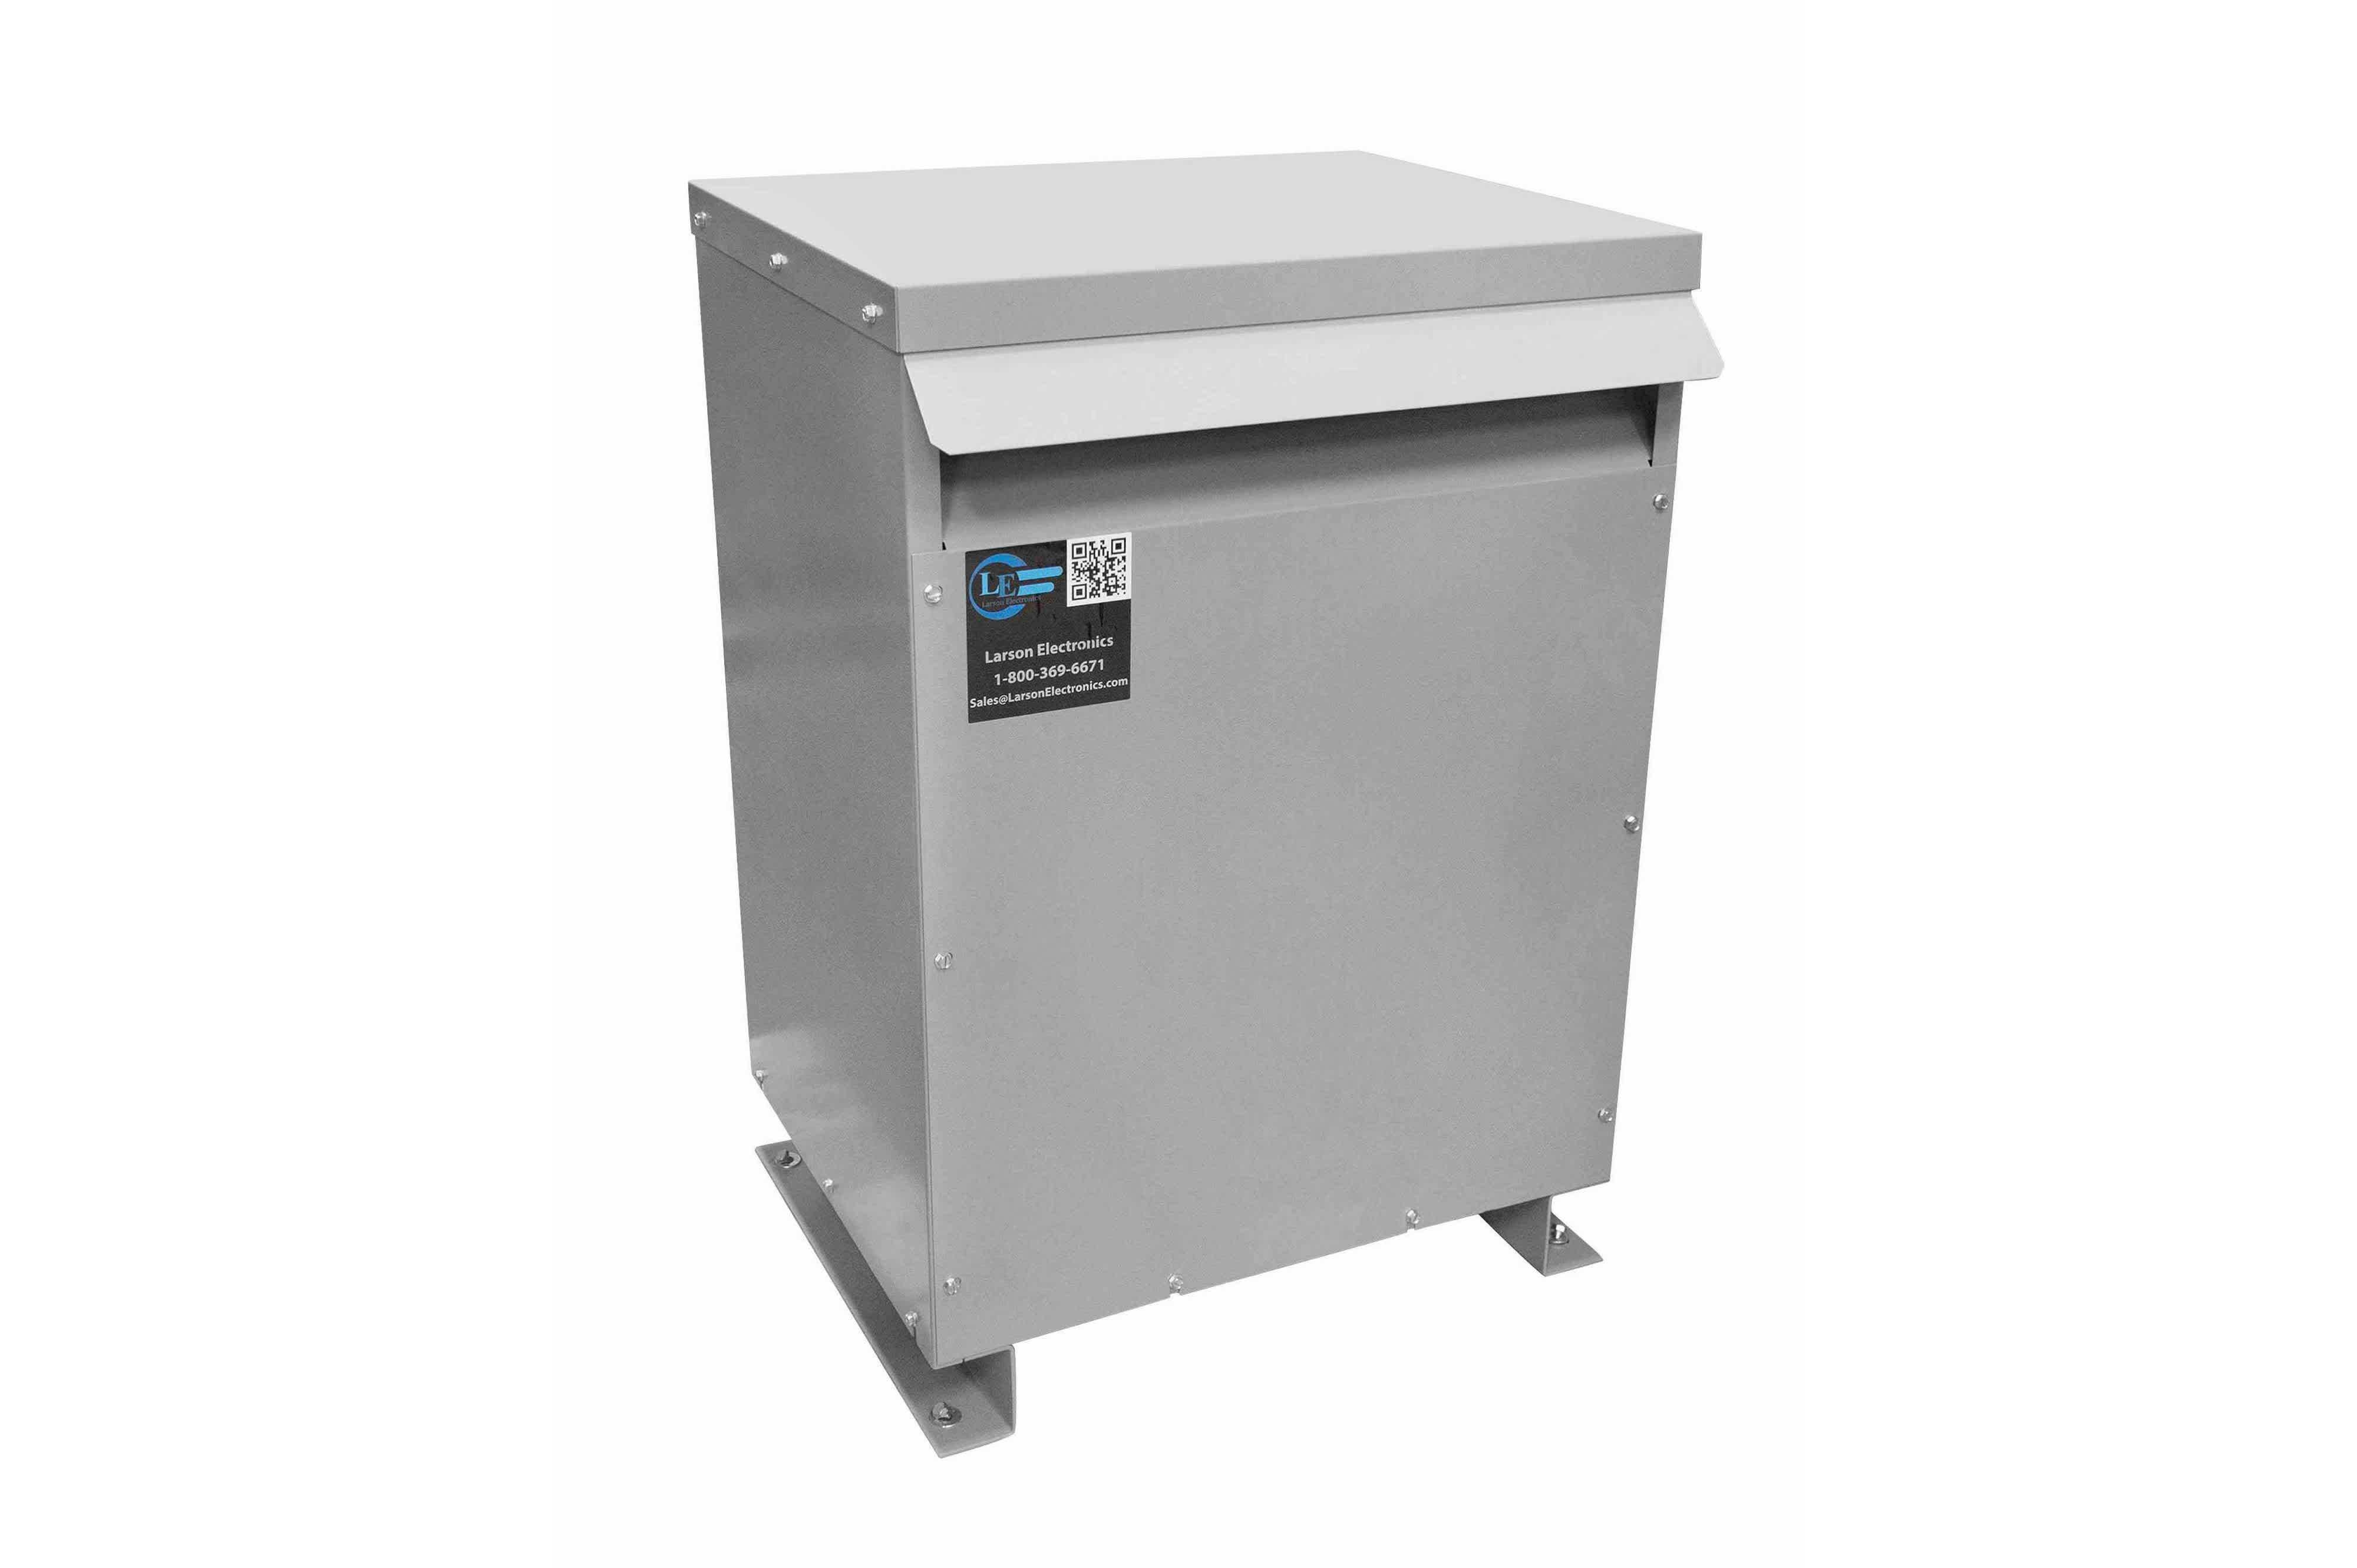 400 kVA 3PH Isolation Transformer, 400V Wye Primary, 208V Delta Secondary, N3R, Ventilated, 60 Hz